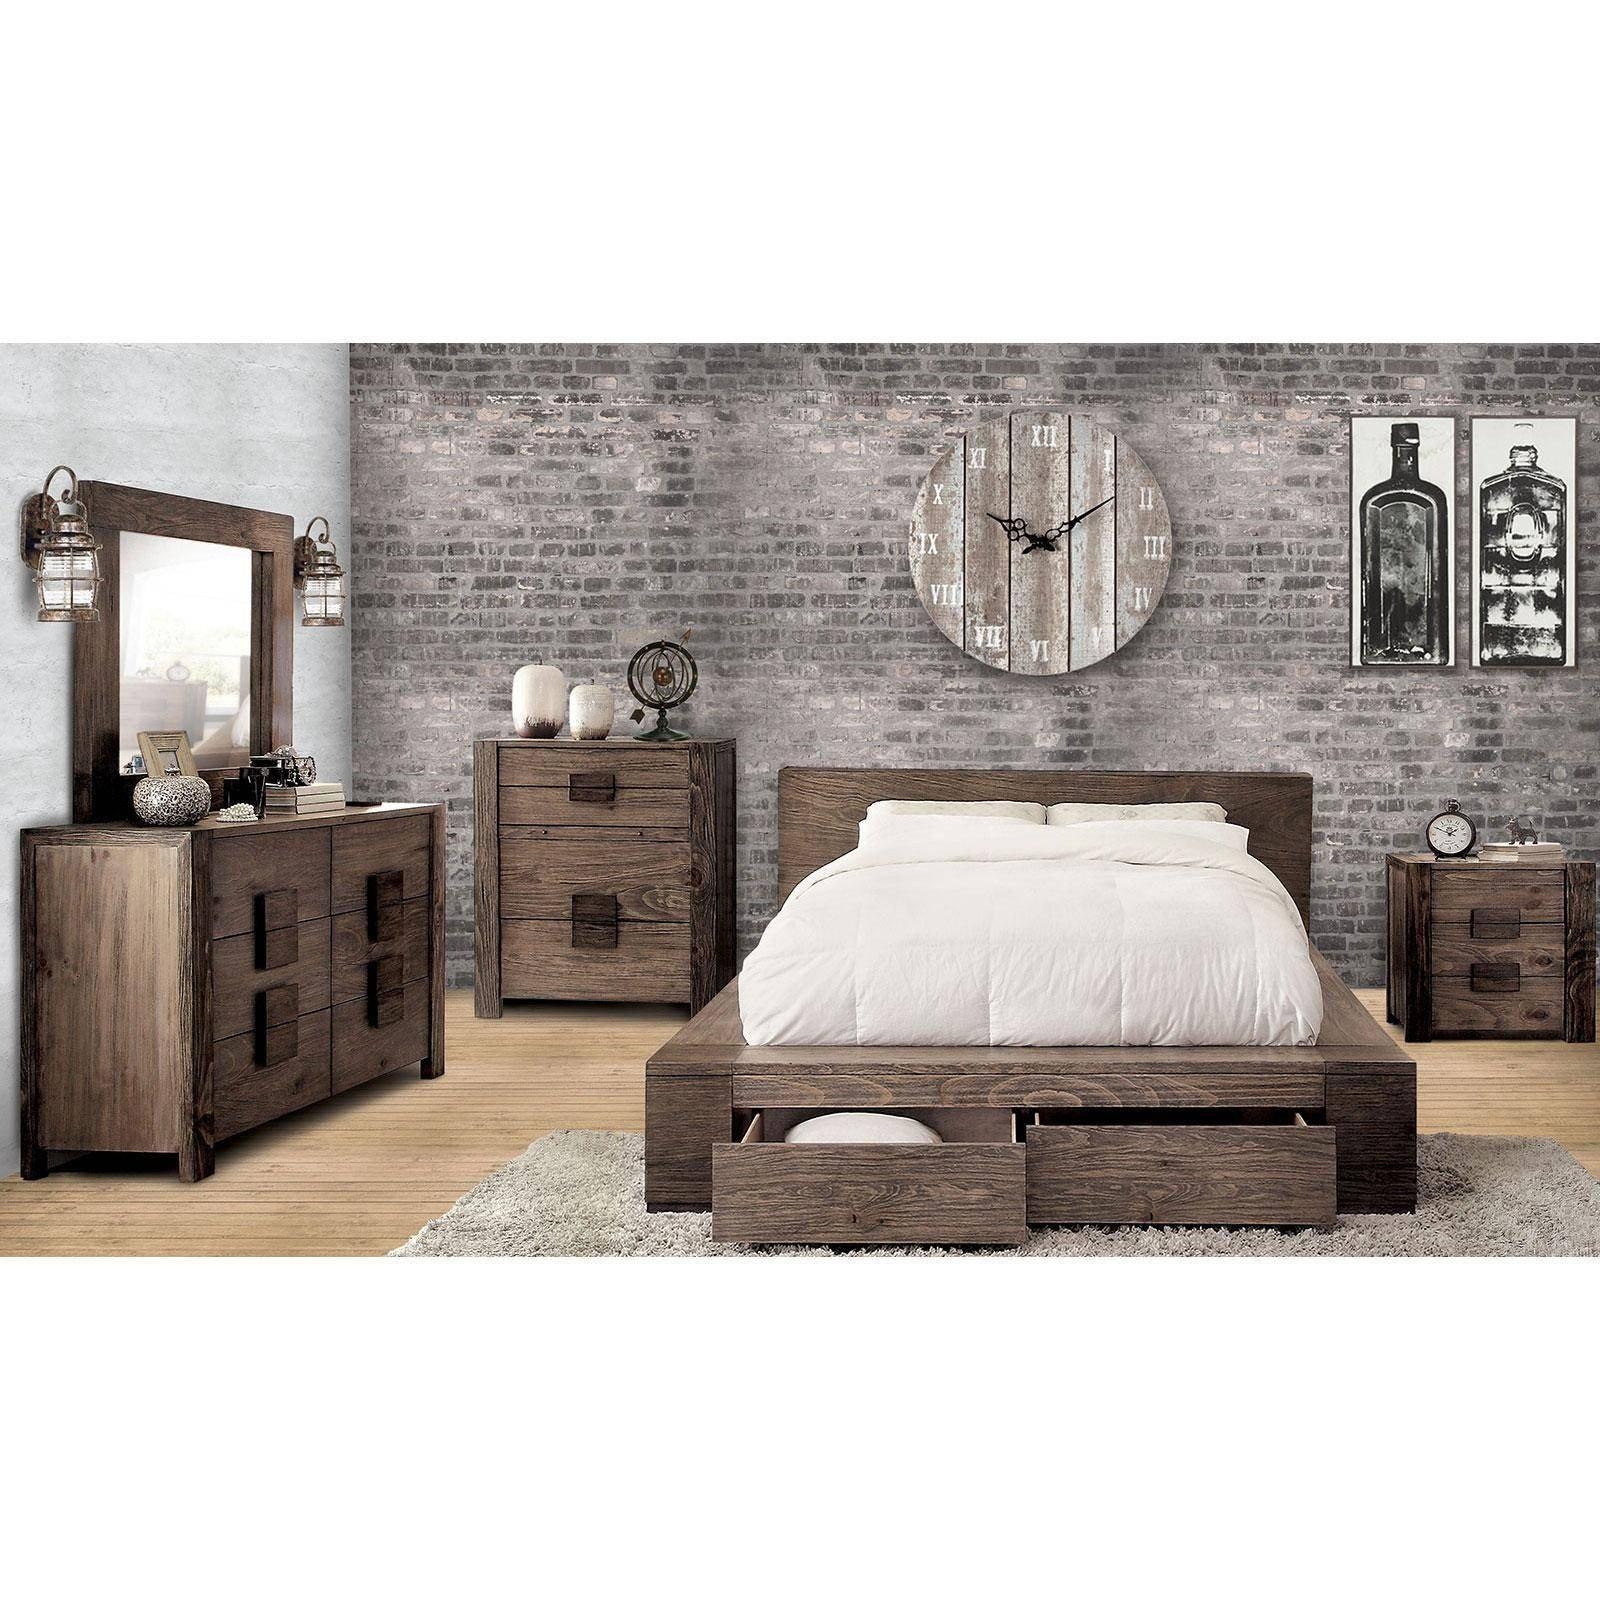 Low Profile Bedroom Set Fresh Rustic Natural Finish Queen Storage Bedroom Set 4 Pcs